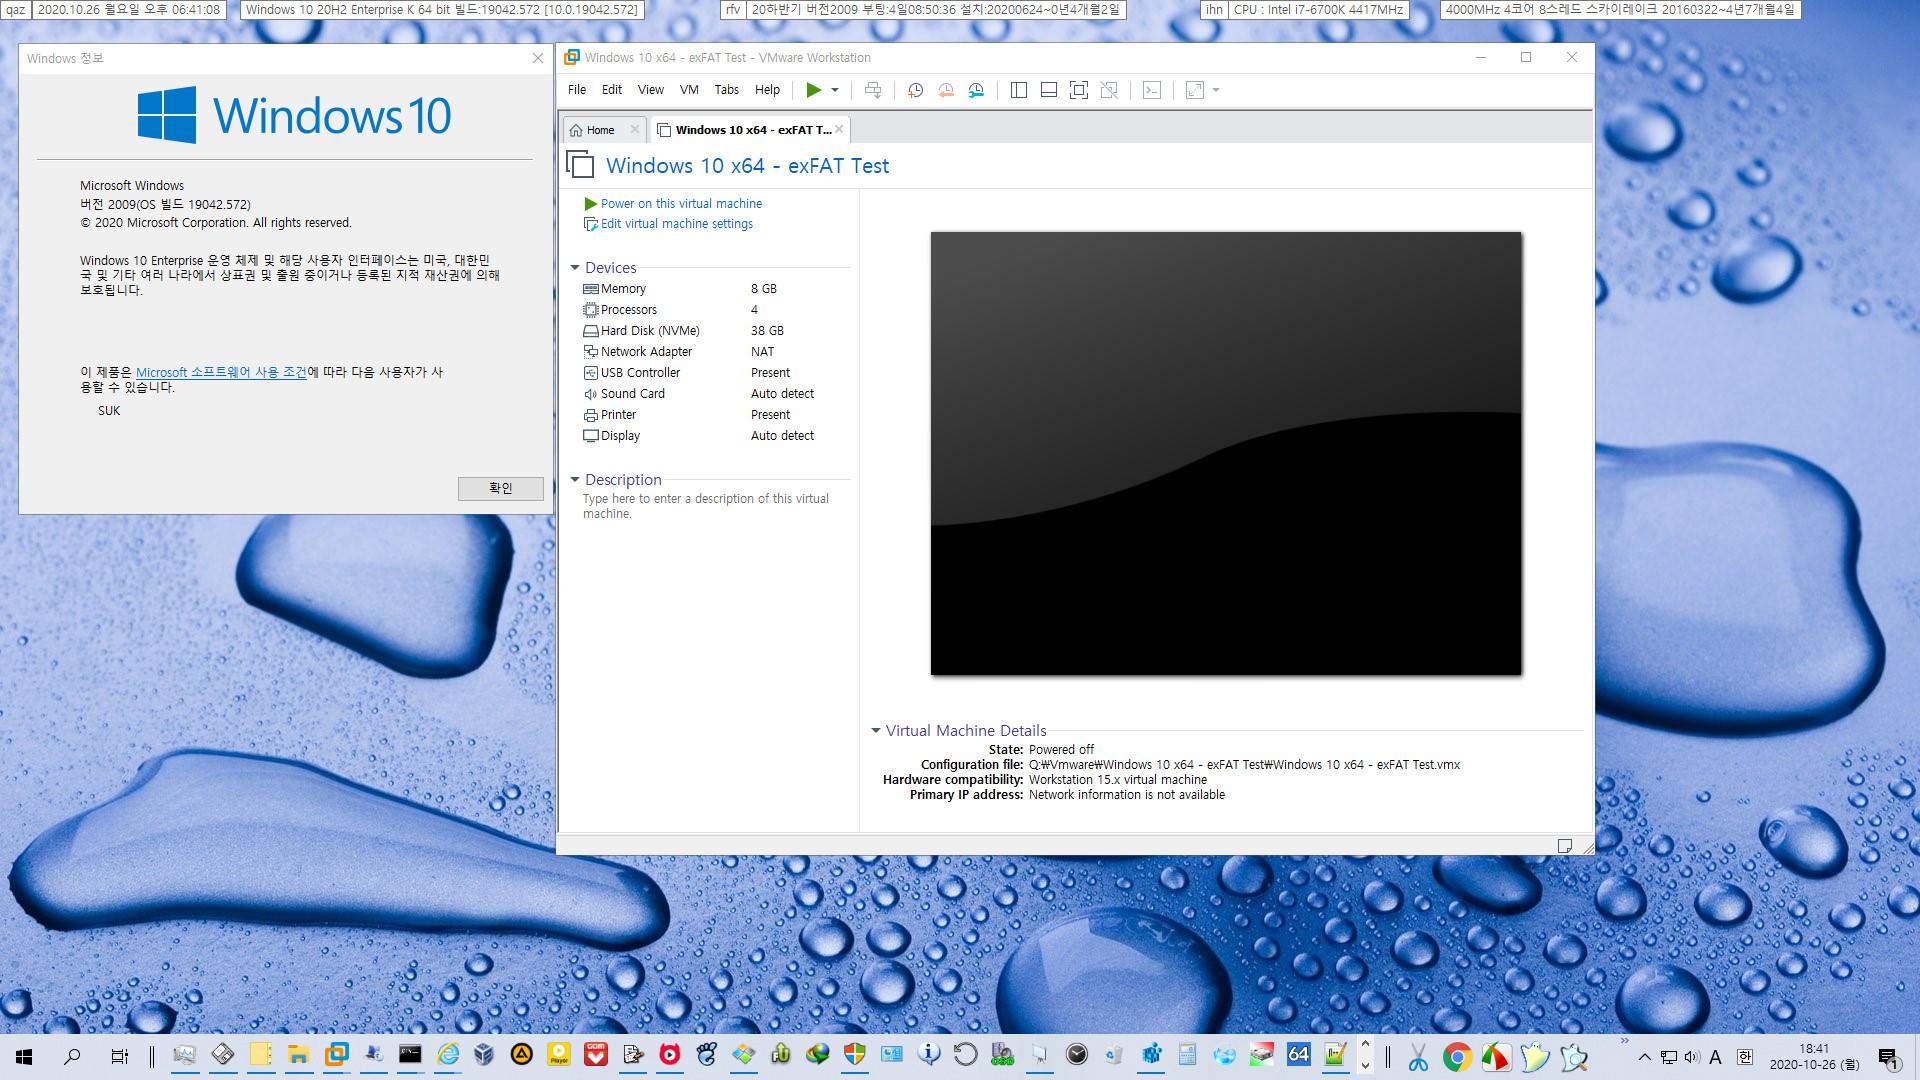 exFAT 포맷으로도 VHD 부팅이 Windows 10 버전 1903부터 된다고 하여 테스트 - 완전 생고생 했습니다 2020-10-26_184108.jpg